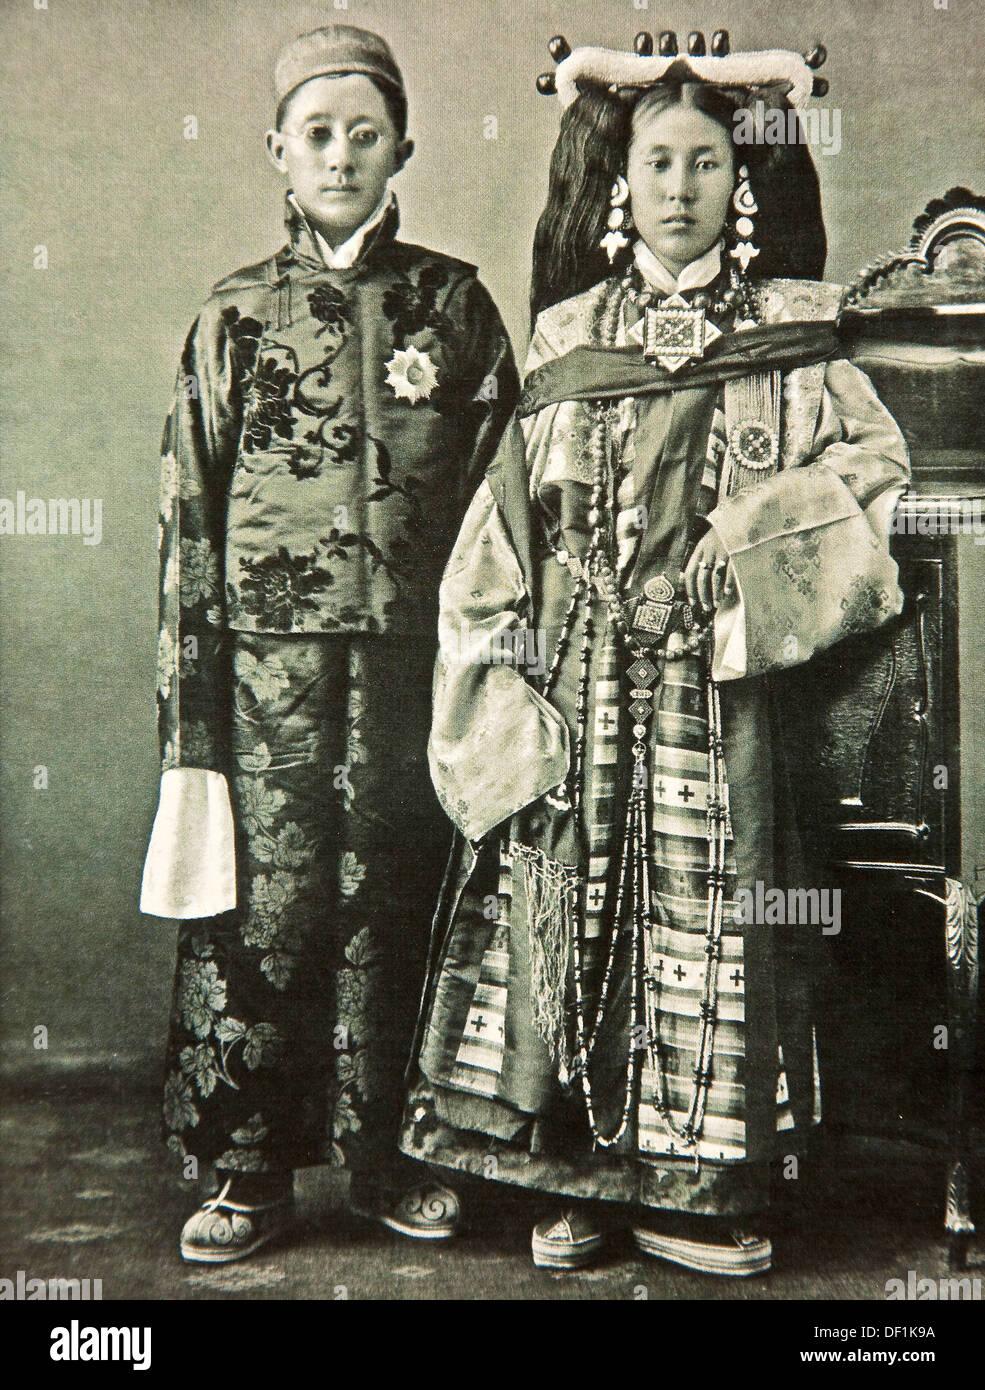 Carte Inde Sikkim.Roi Et Reine De Sikkim Inde Carte Postale Vers 1920 Banque D